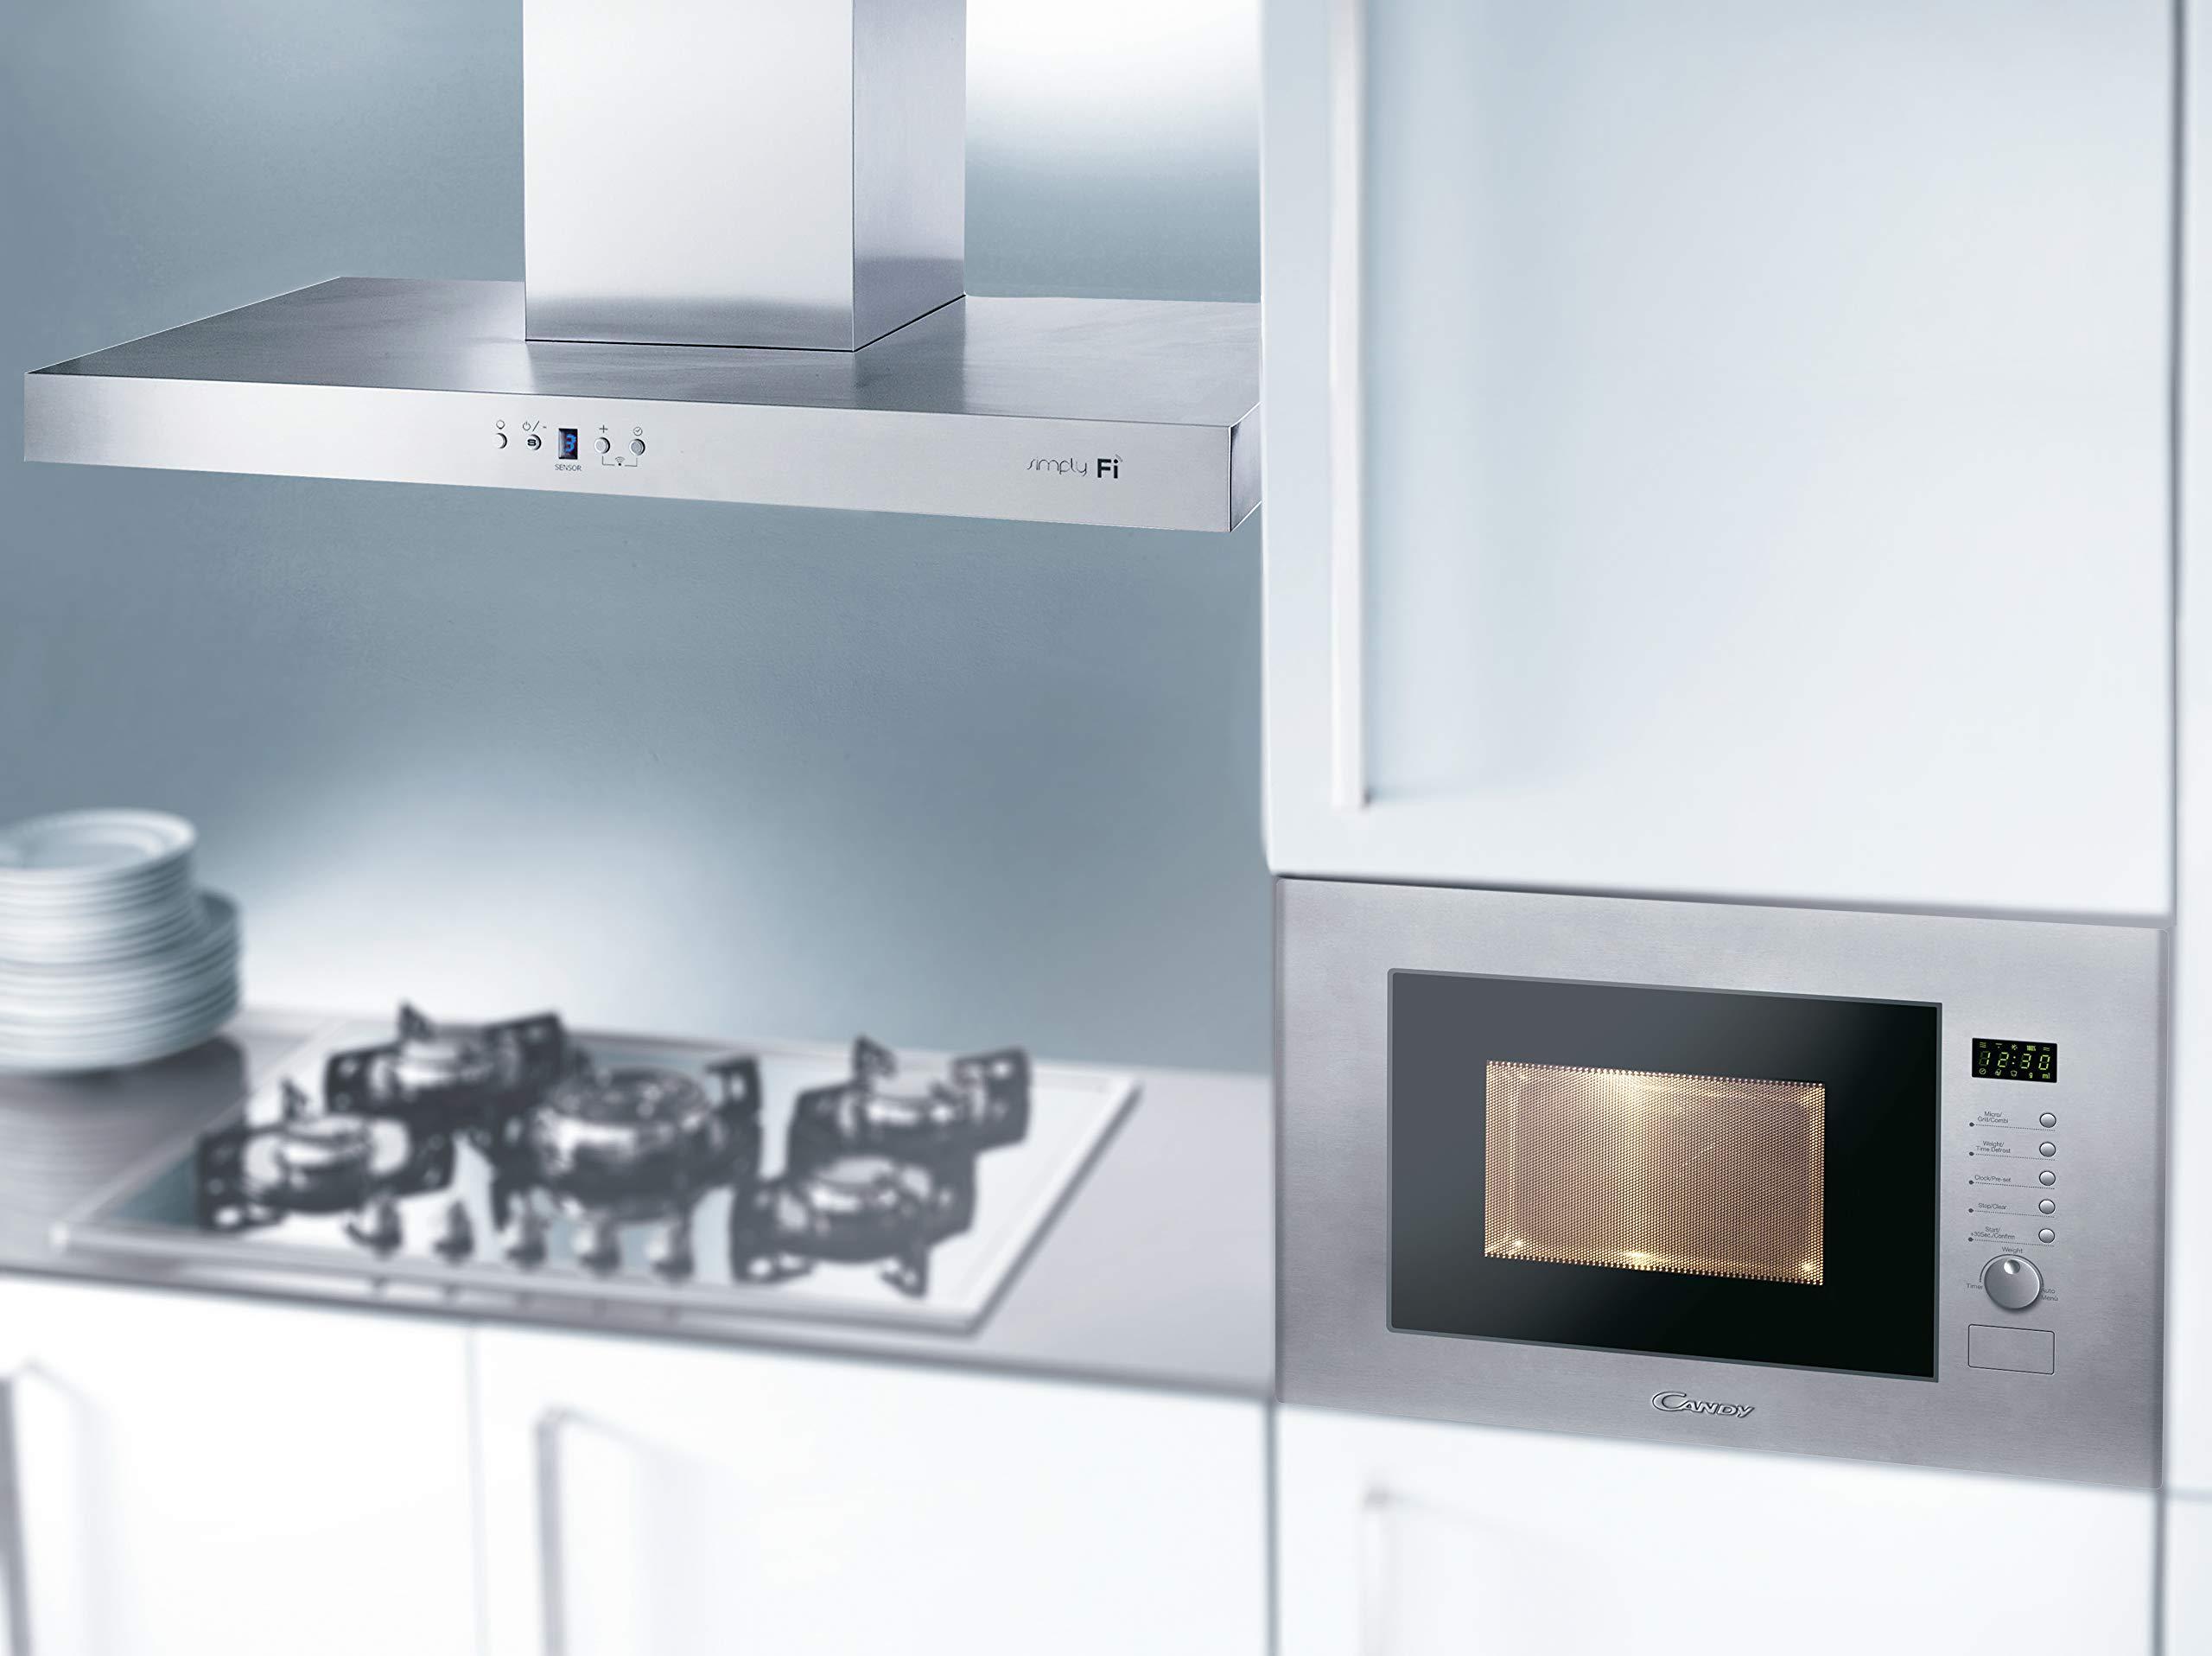 Candy MIC20GDFX Microondas integrable con grill, 10 programas, display digital, plato giratorio 24,5 cm, potencia 800 W-1000 W, 20 litros, gris: 141.57: Amazon.es: Hogar